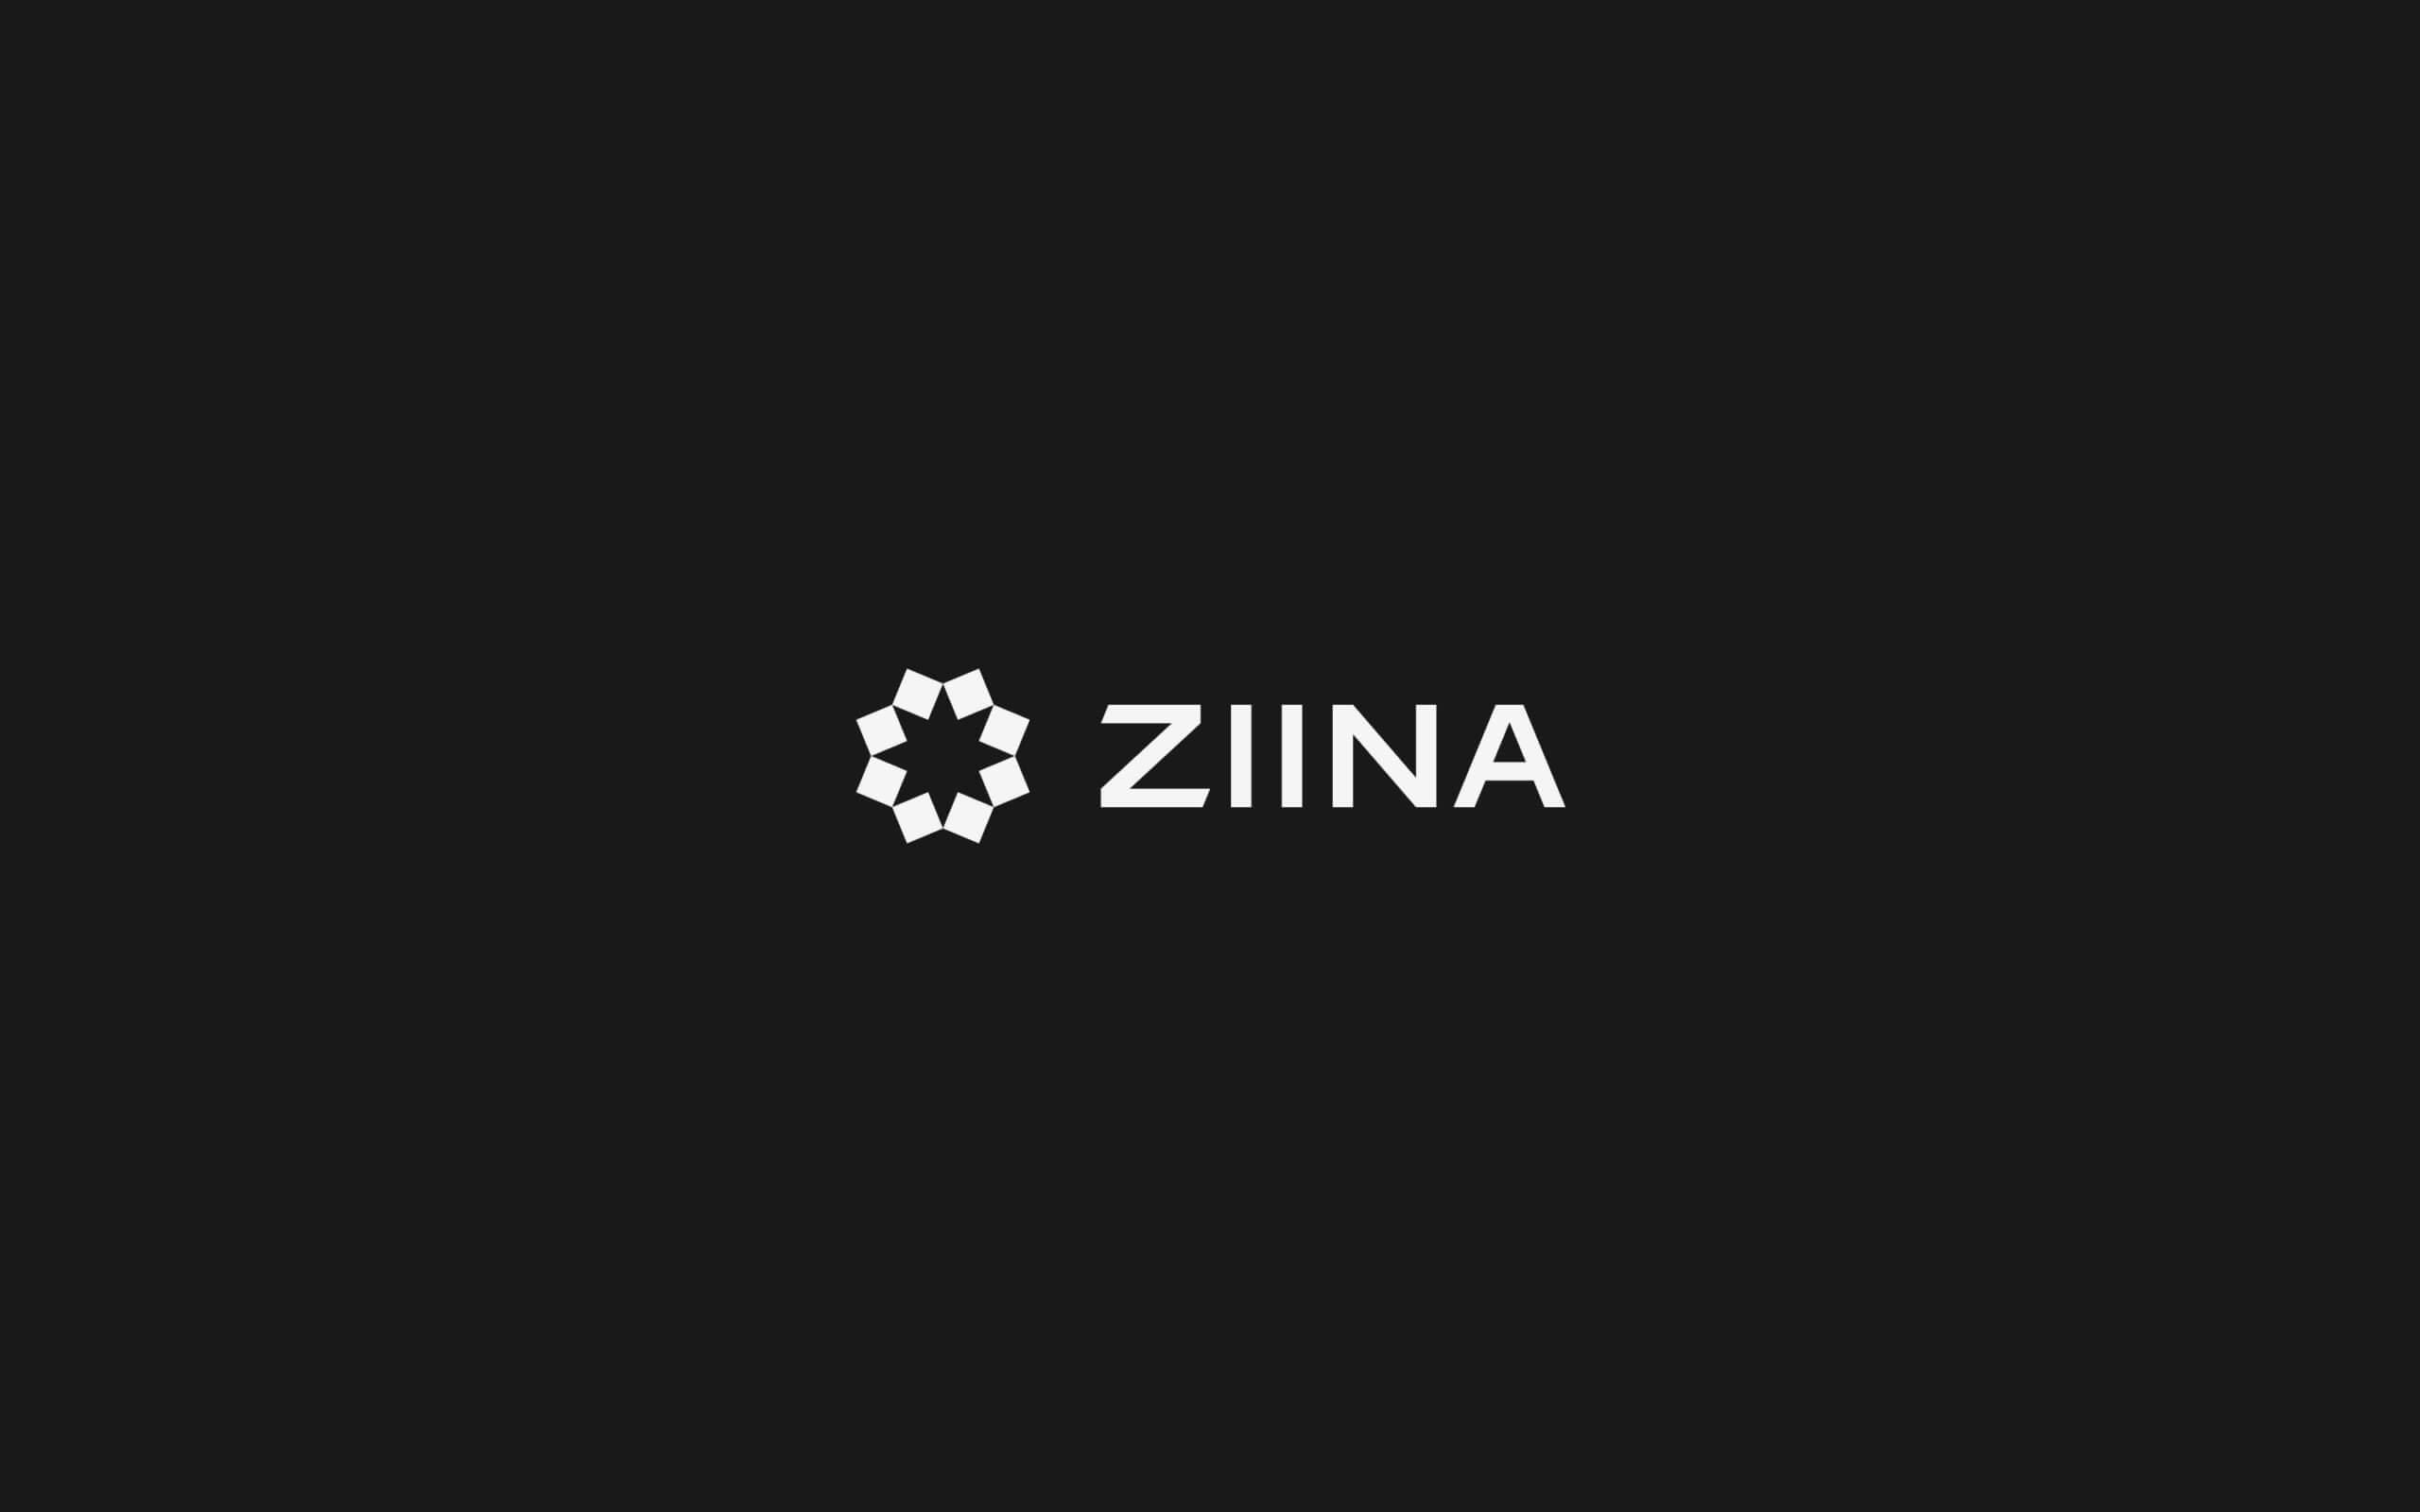 Ziina PortfolioArtboard 1